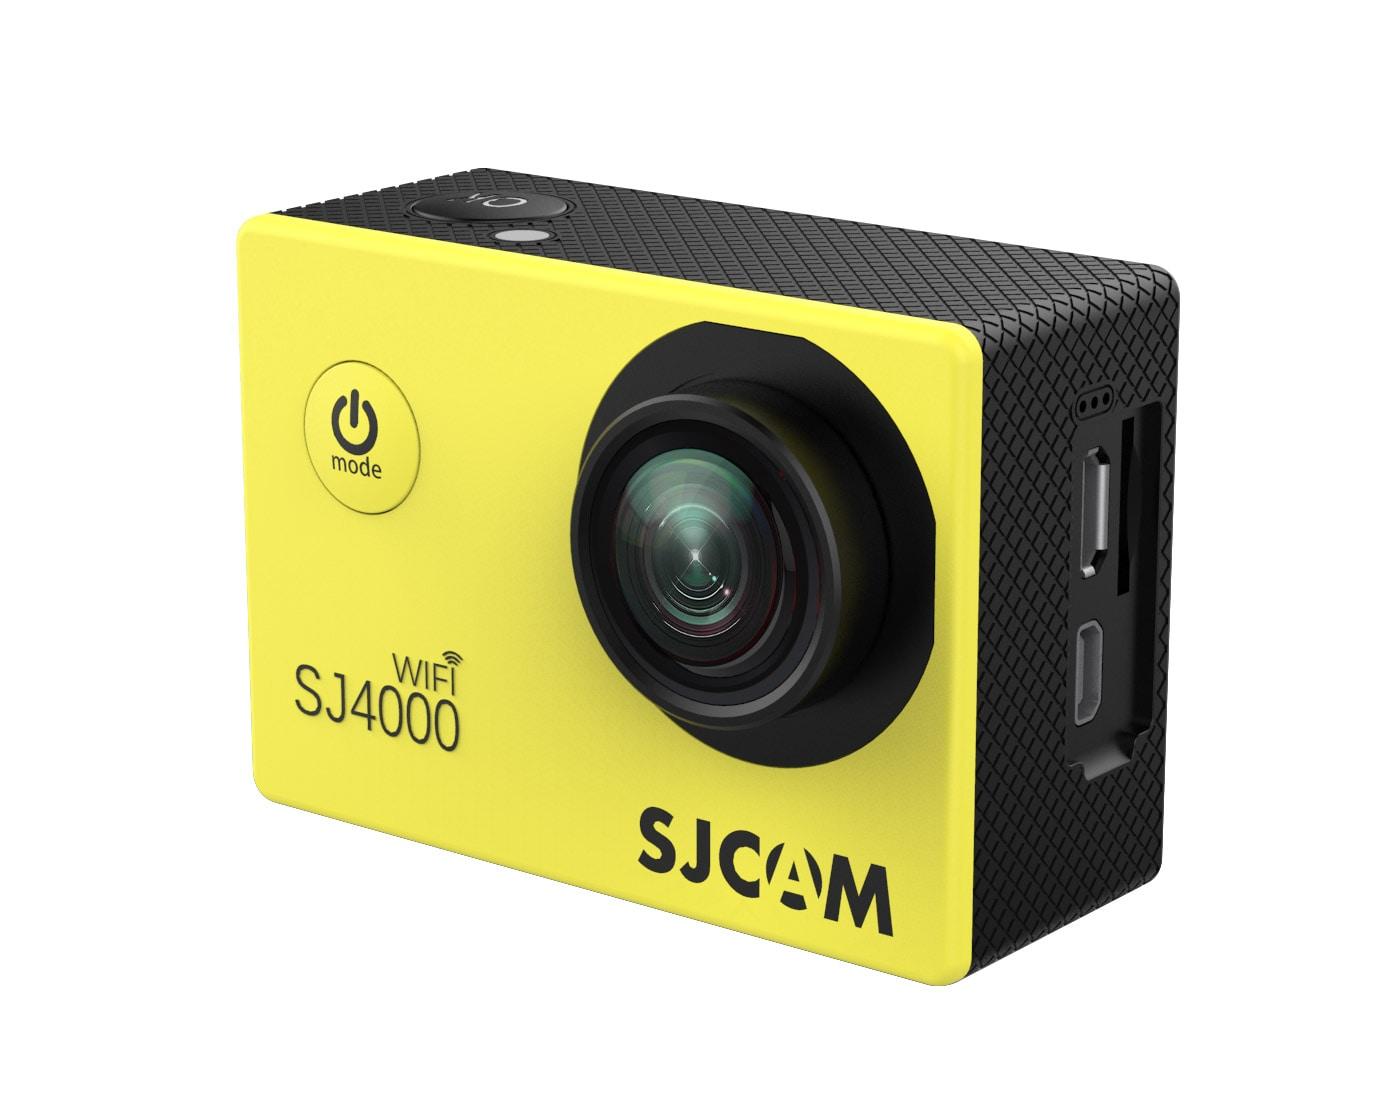 SJCAM SJ4000 WIFI Action Camera FHD1080P waterproof Underwater Camera 12MP Sports Camcorder  Red - 8